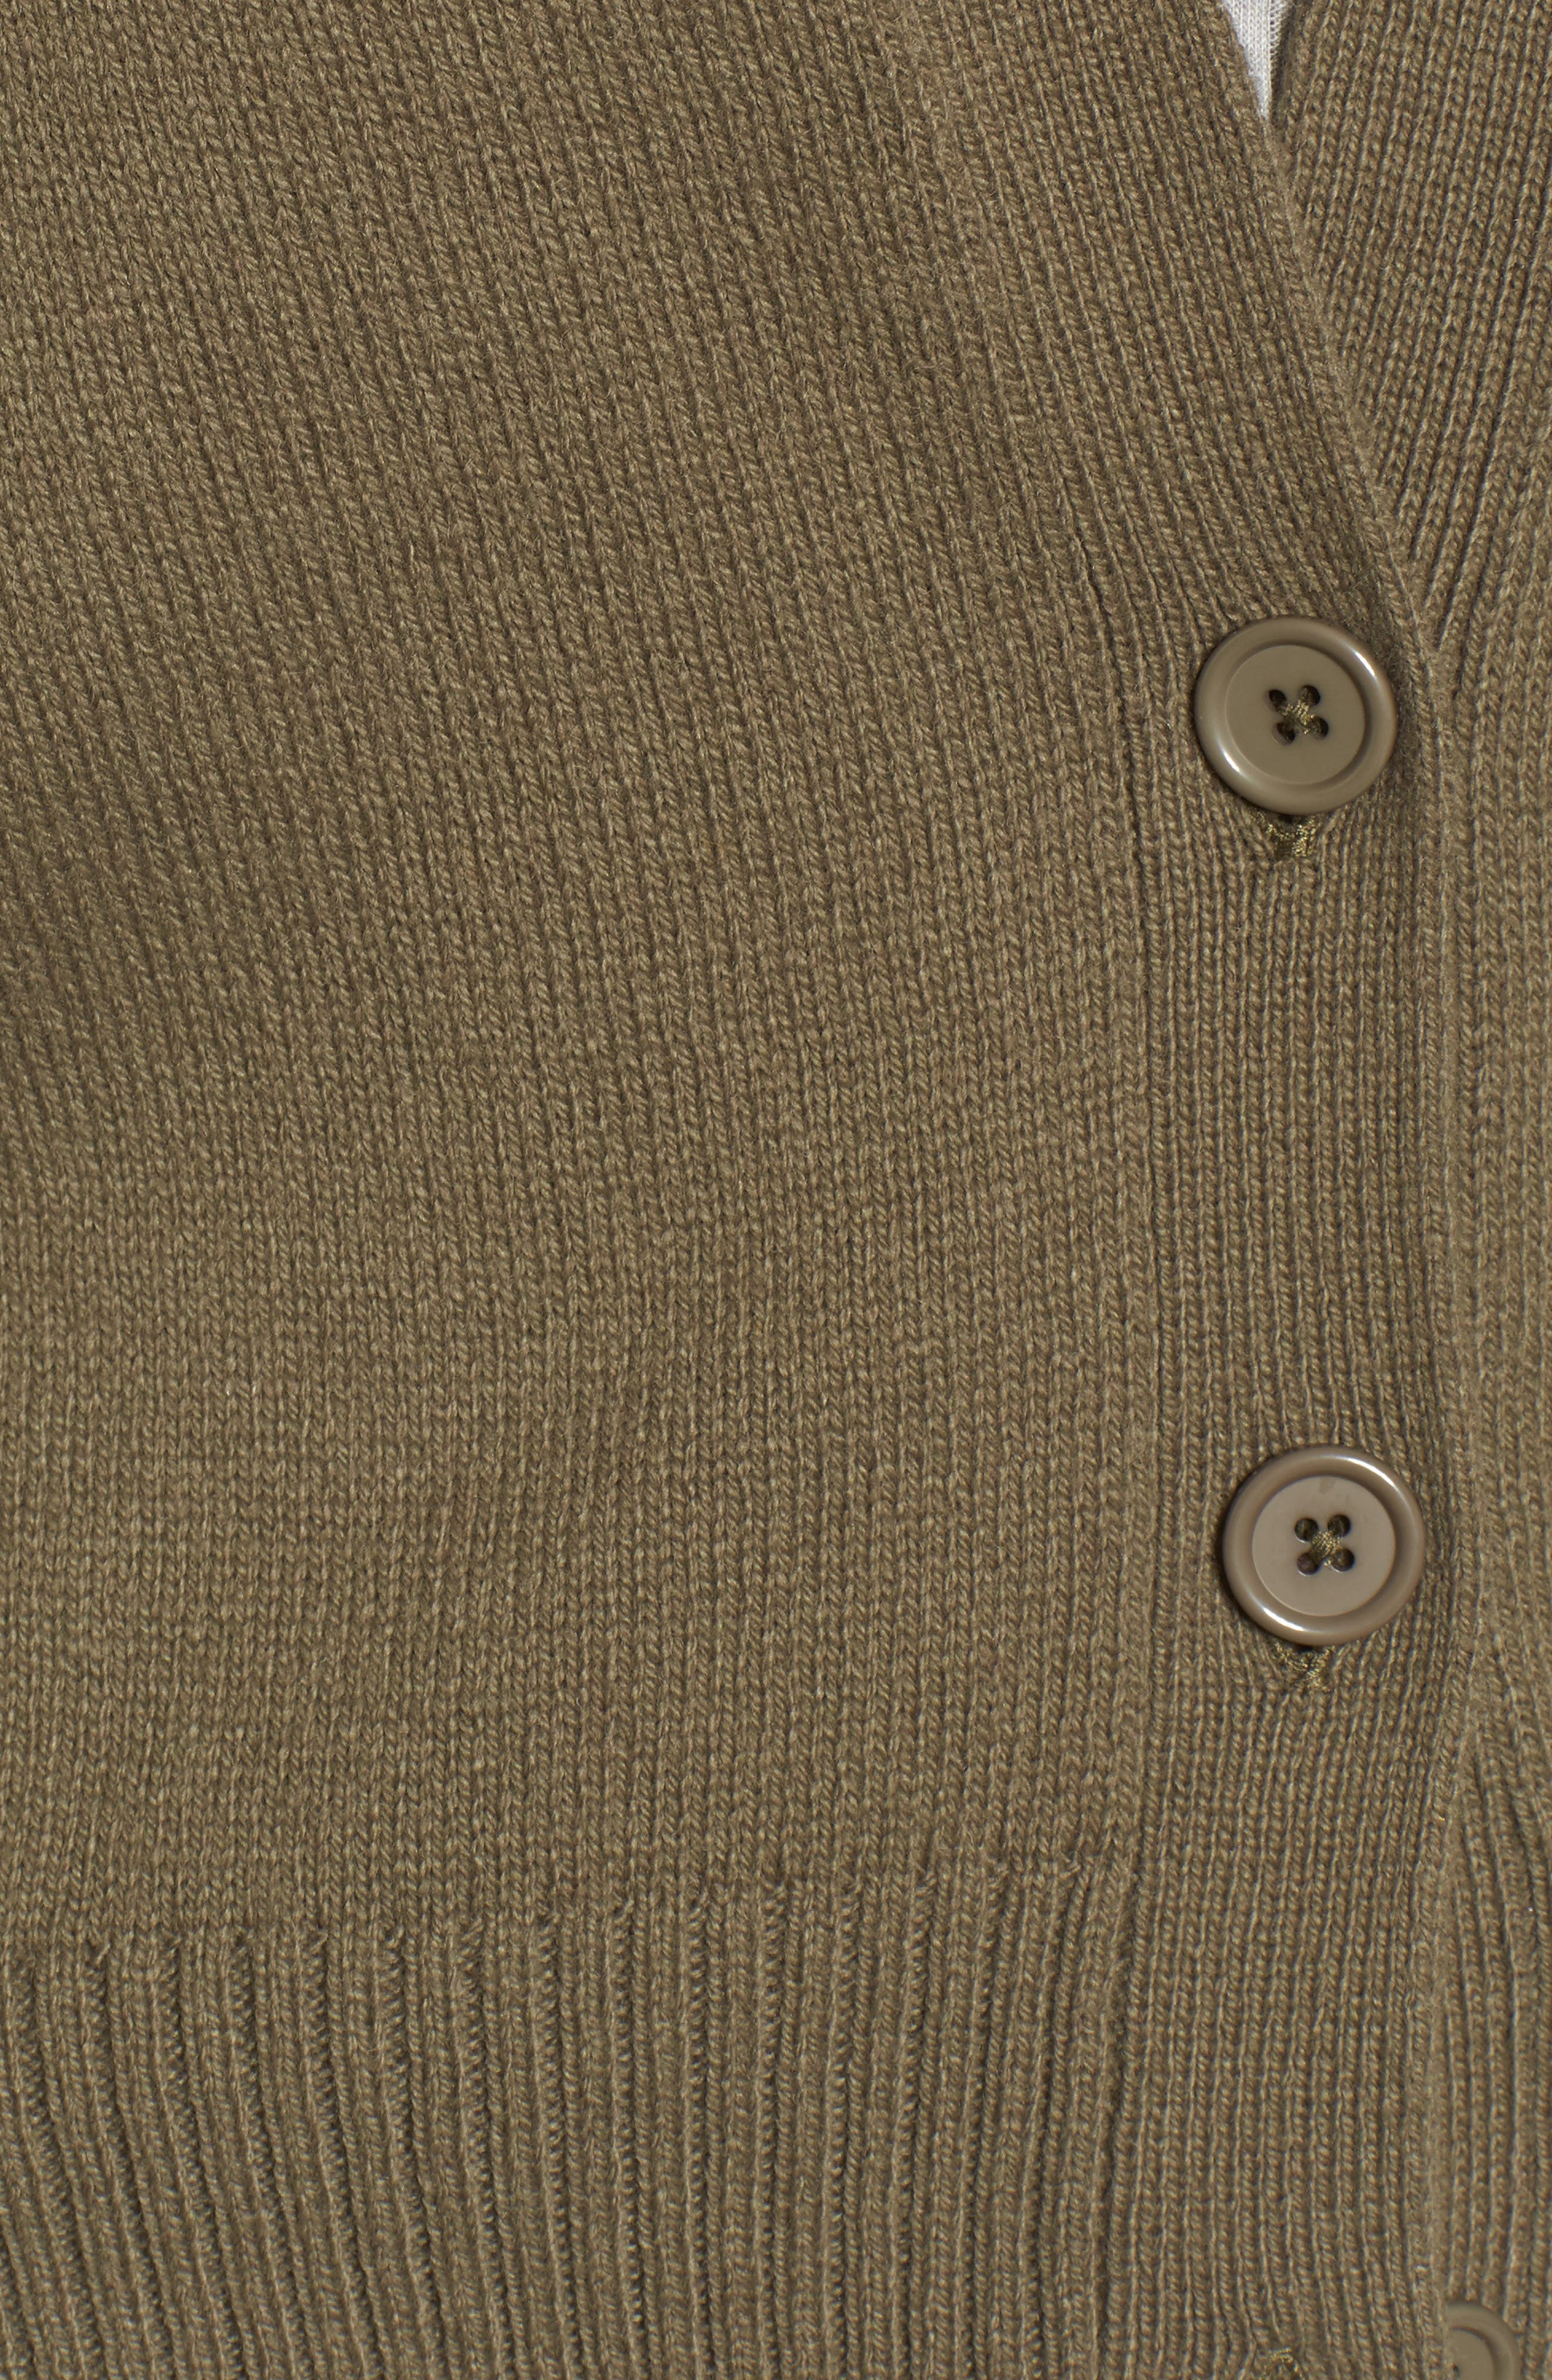 Bow Sleeve Cardigan,                             Alternate thumbnail 5, color,                             311